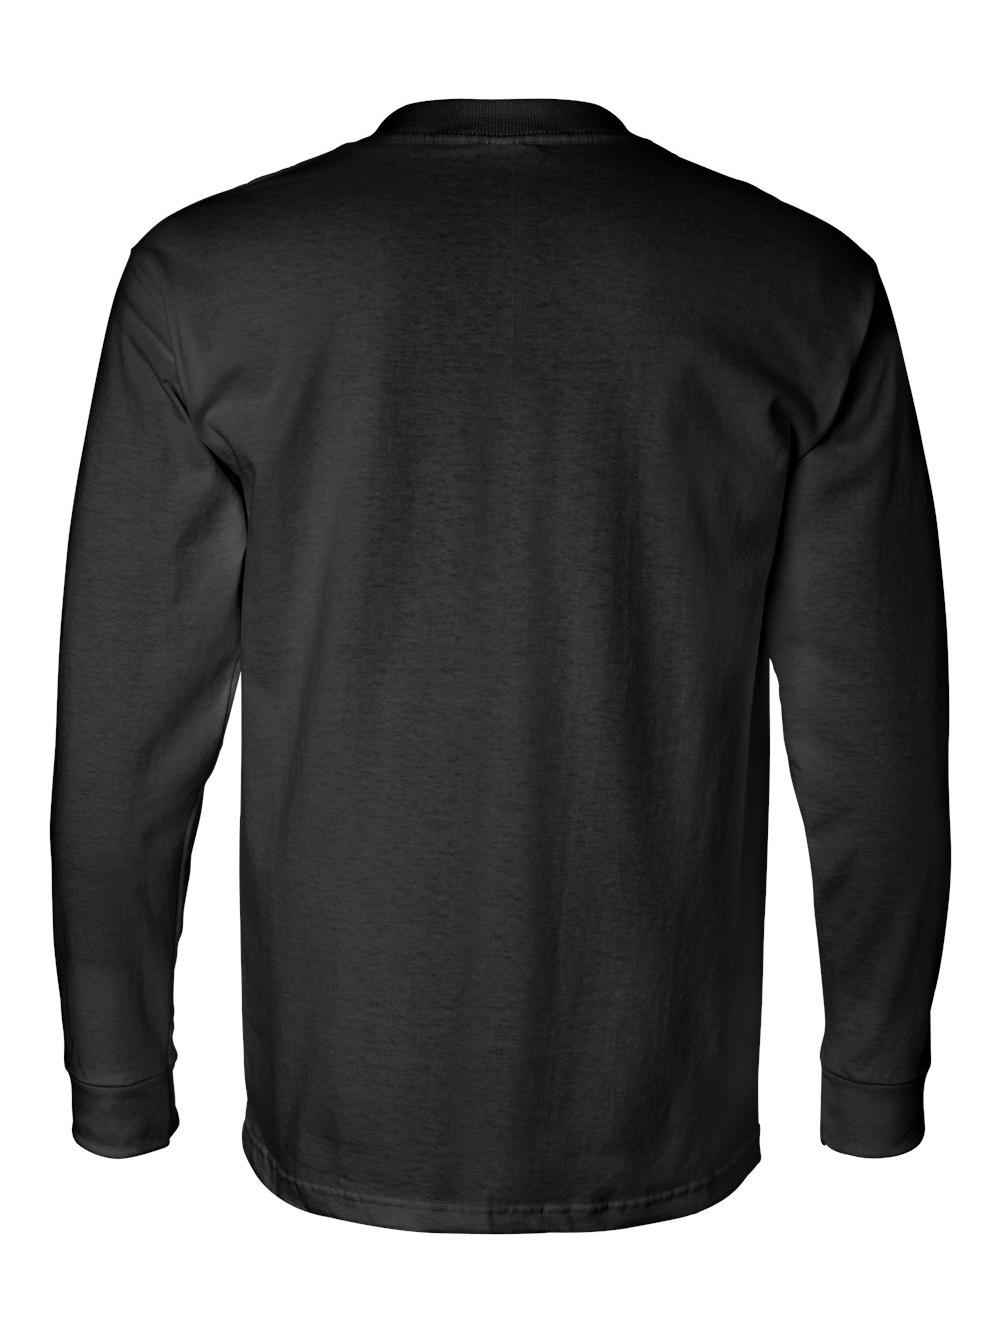 Bayside-USA-Made-Long-Sleeve-T-Shirt-with-a-Pocket-8100 thumbnail 7